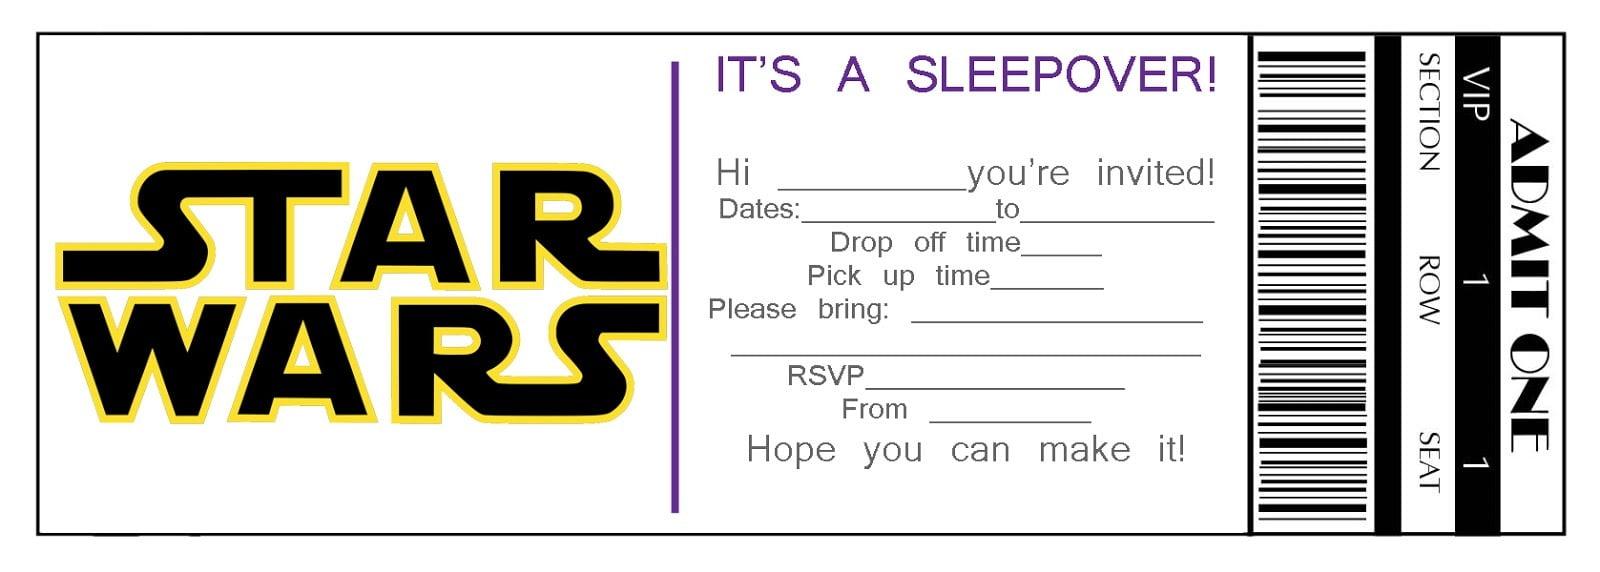 Free Printable Birthday Invitations For Boys Sleepover Party